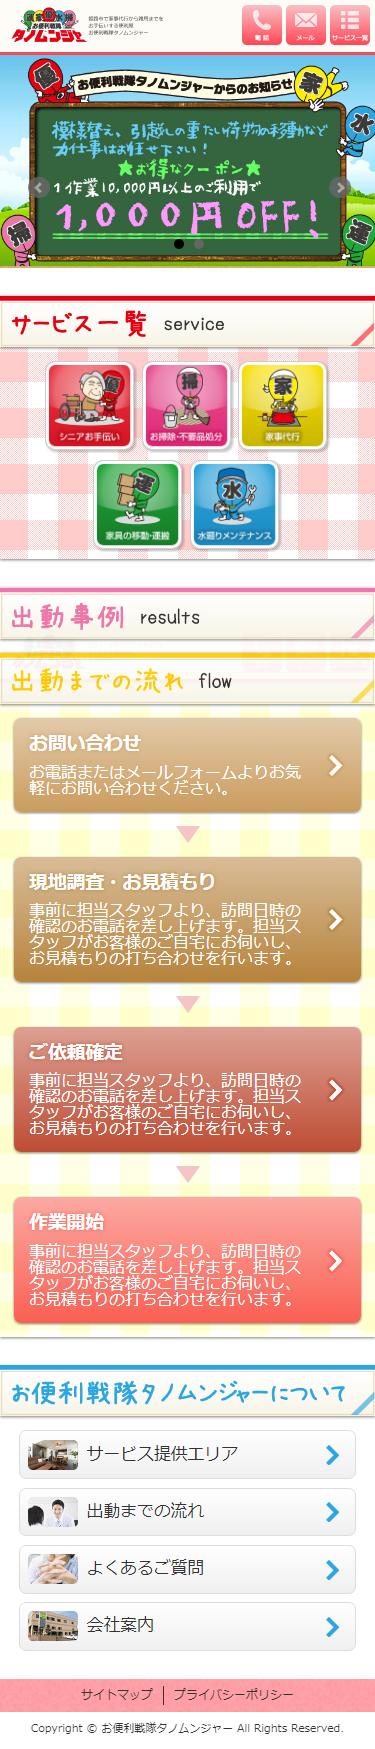 姫路市 坂上住設株式会社様 ホームページ制作3